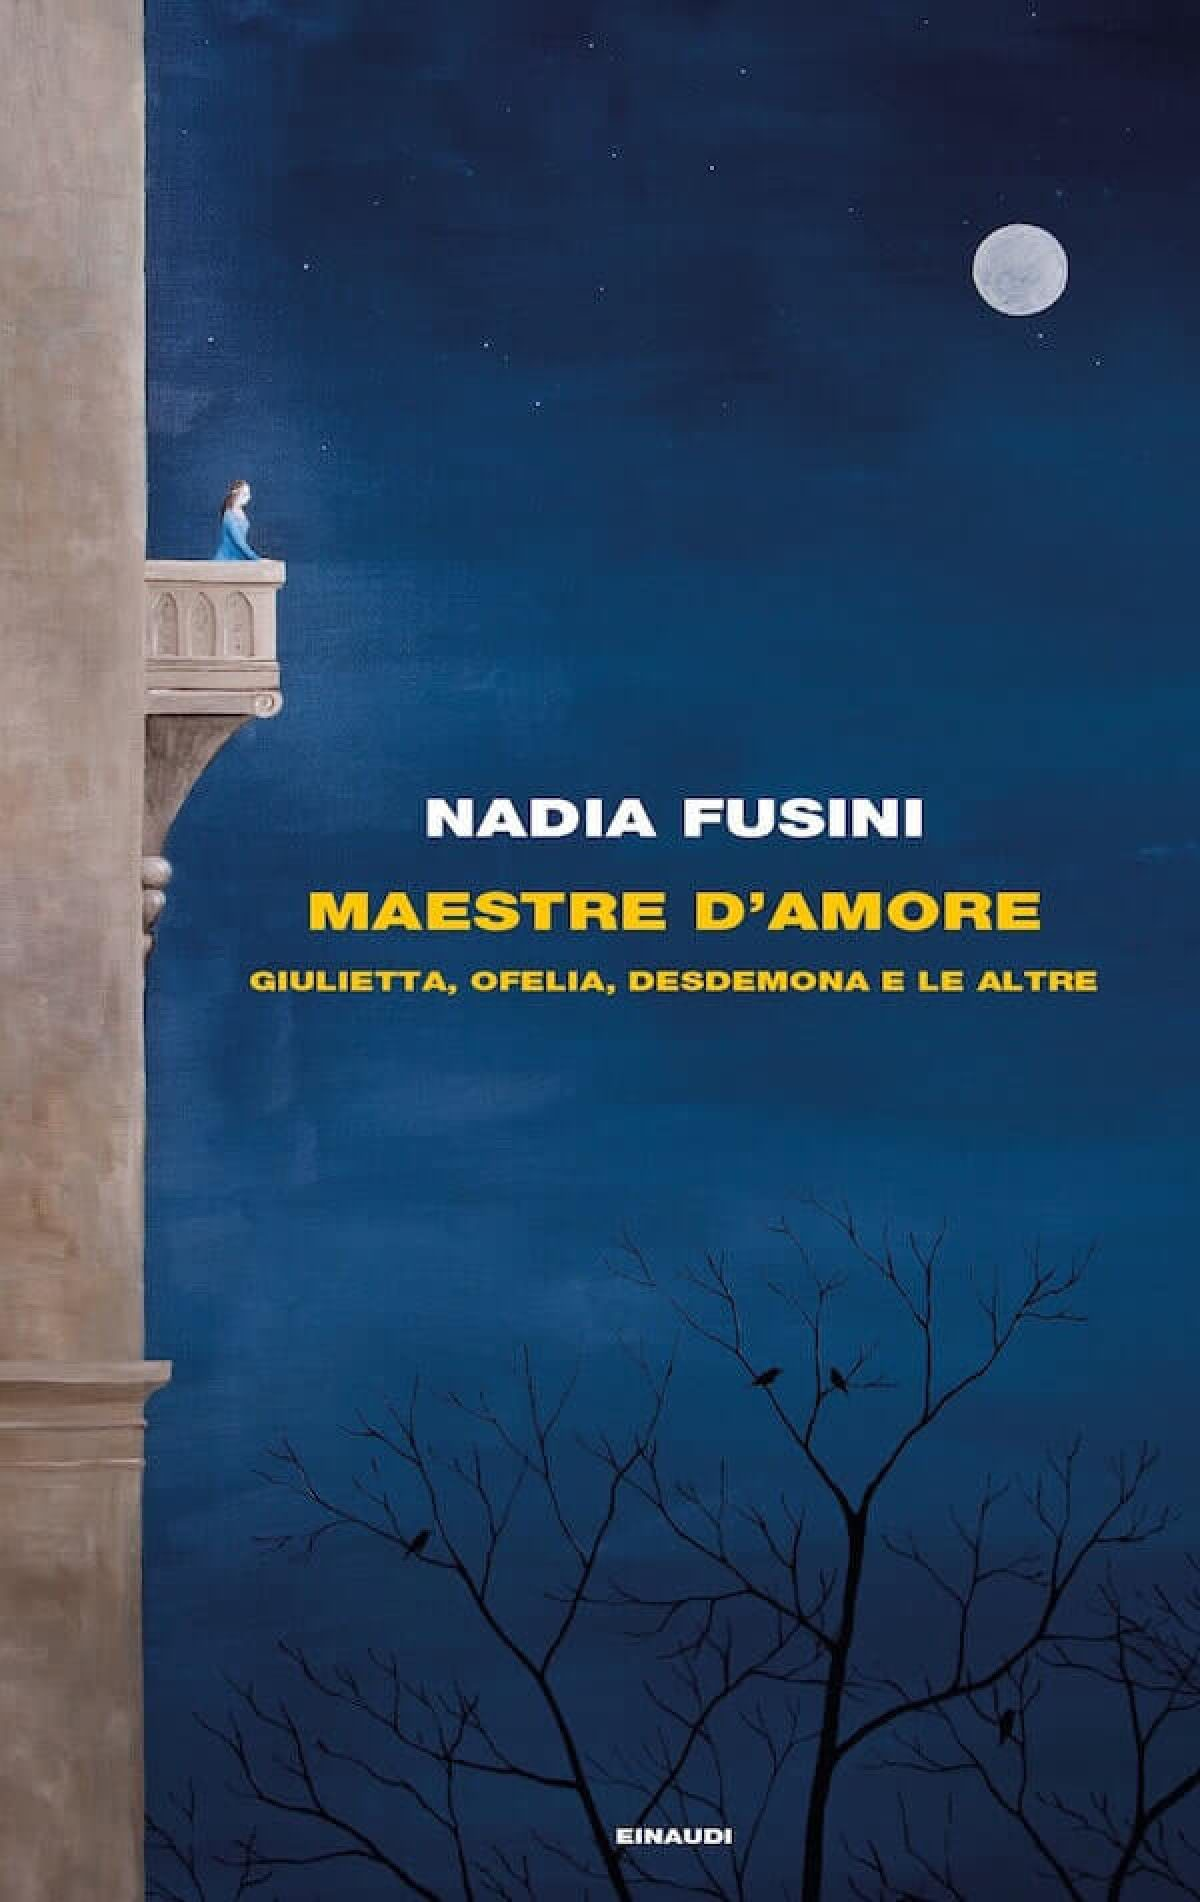 Nadia Fusini, Maestre d'amore, Einaudi